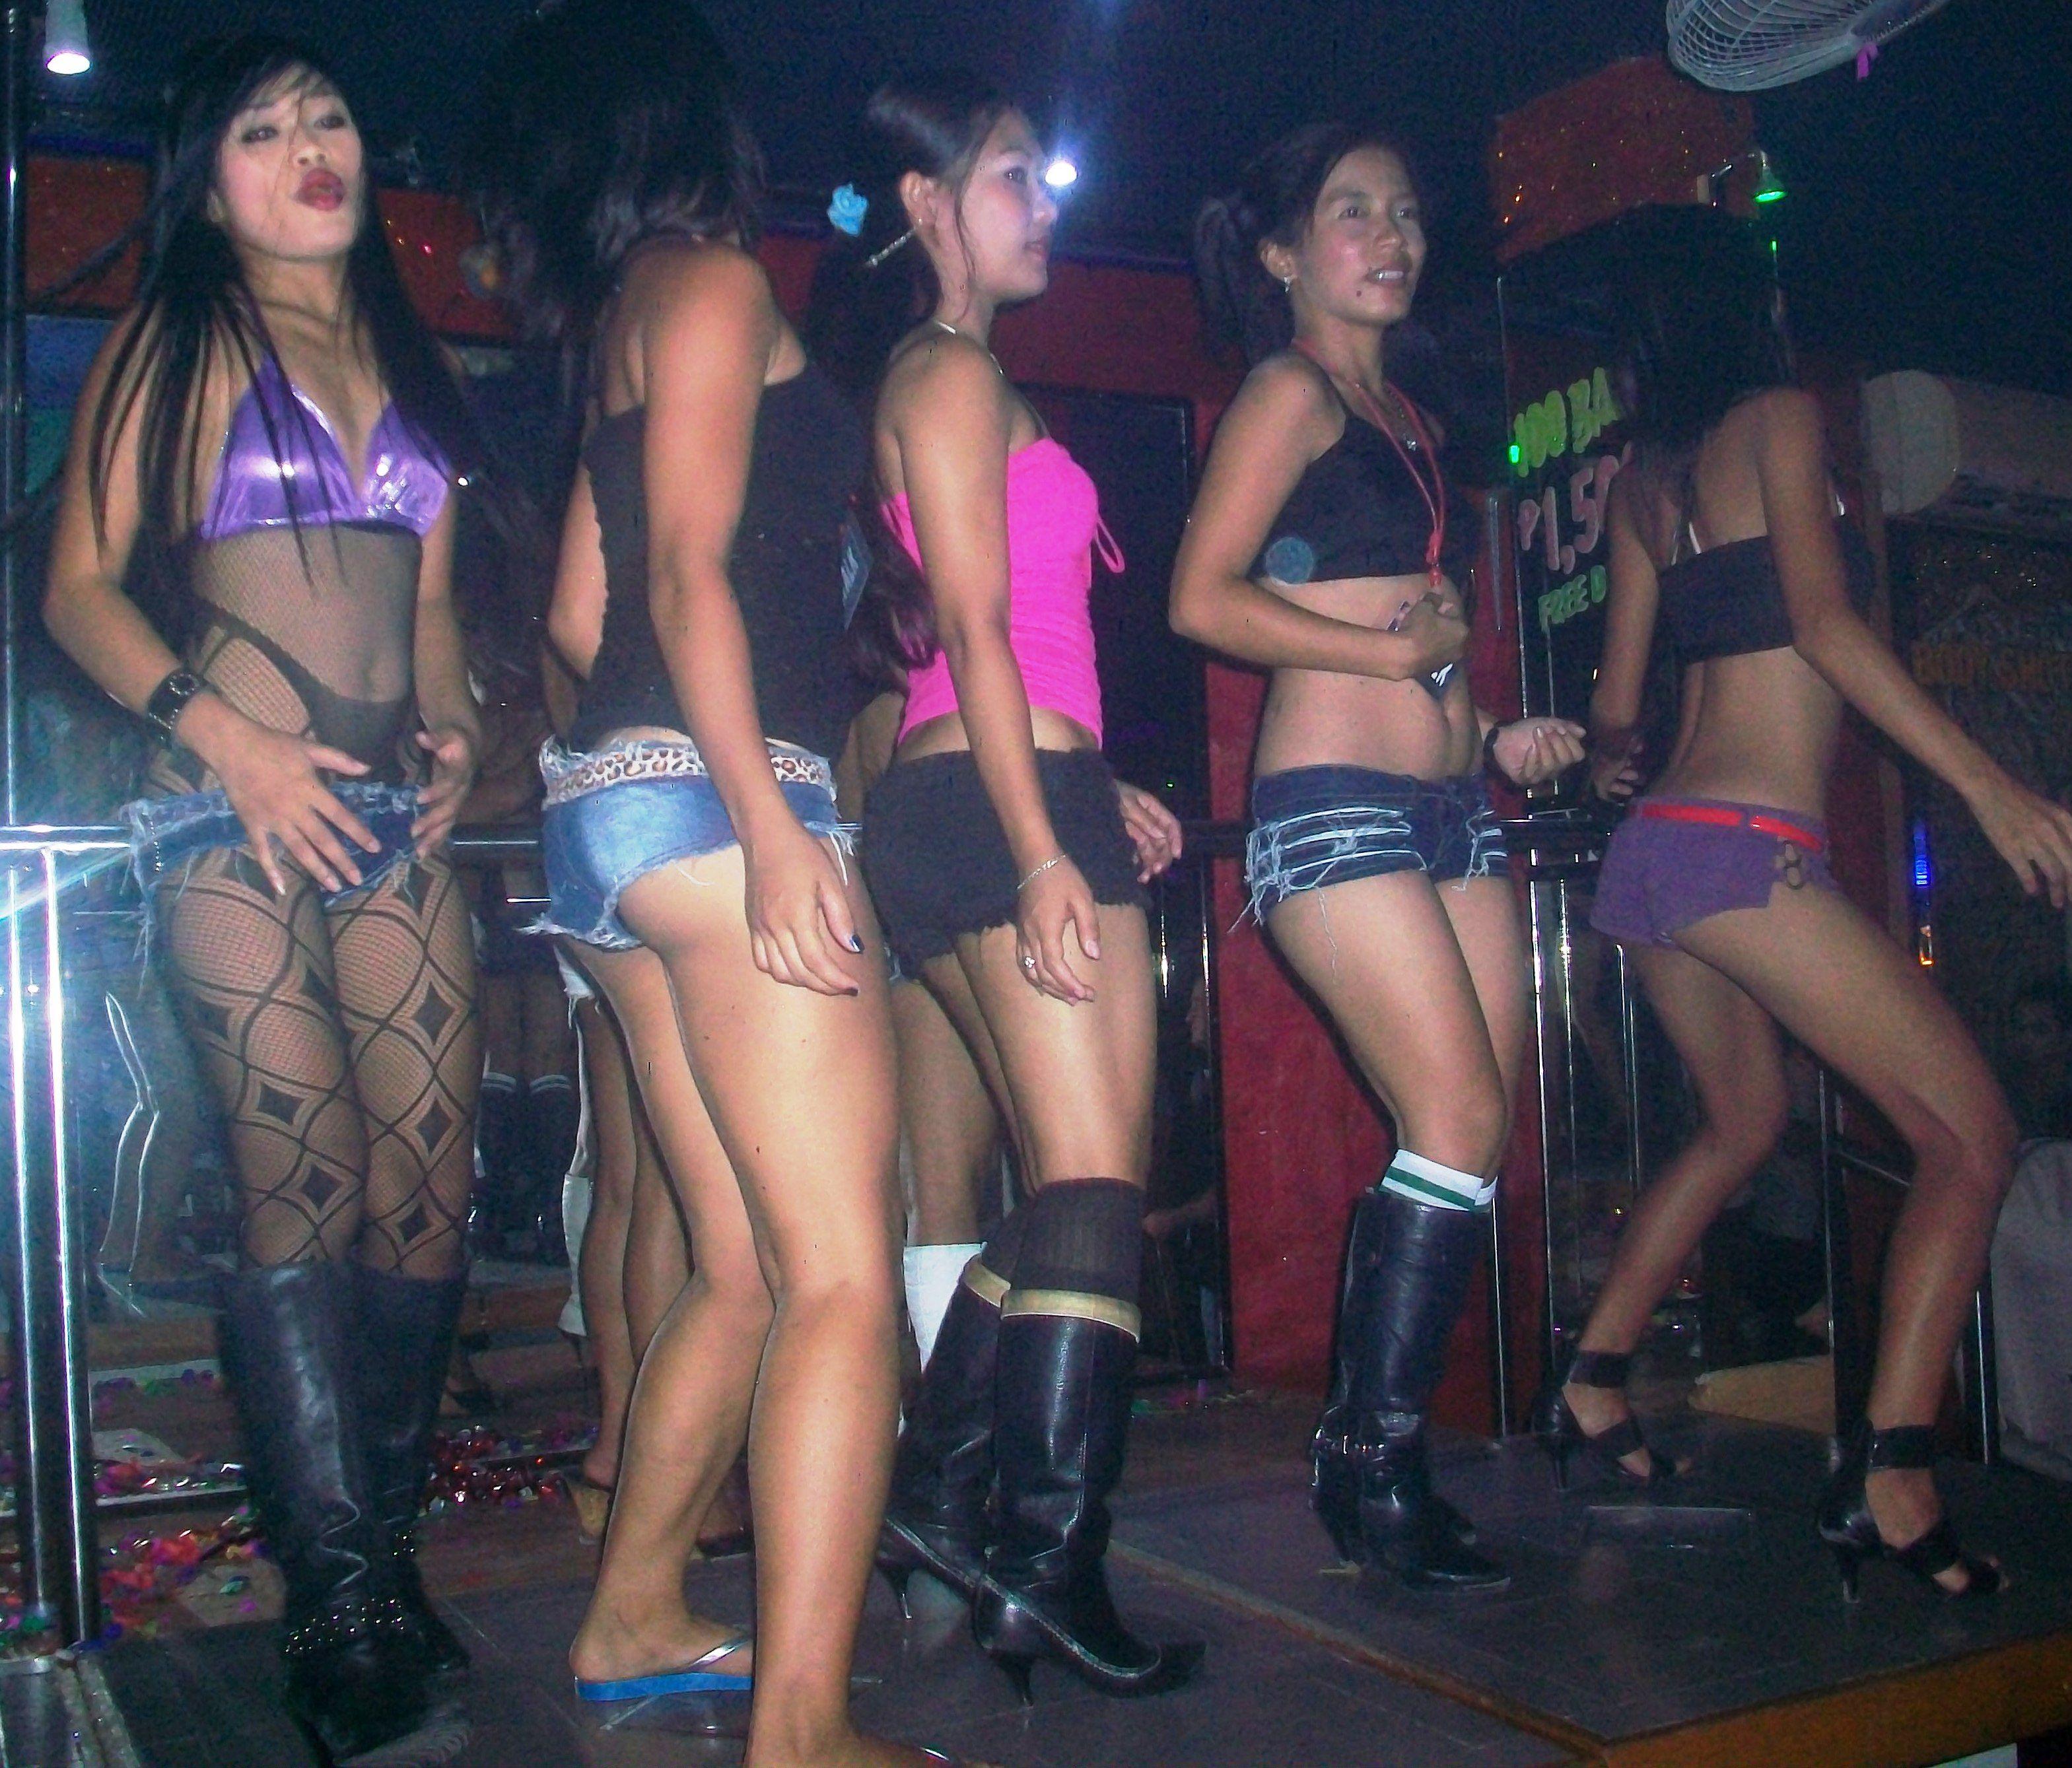 Barretto bar girl nude photo